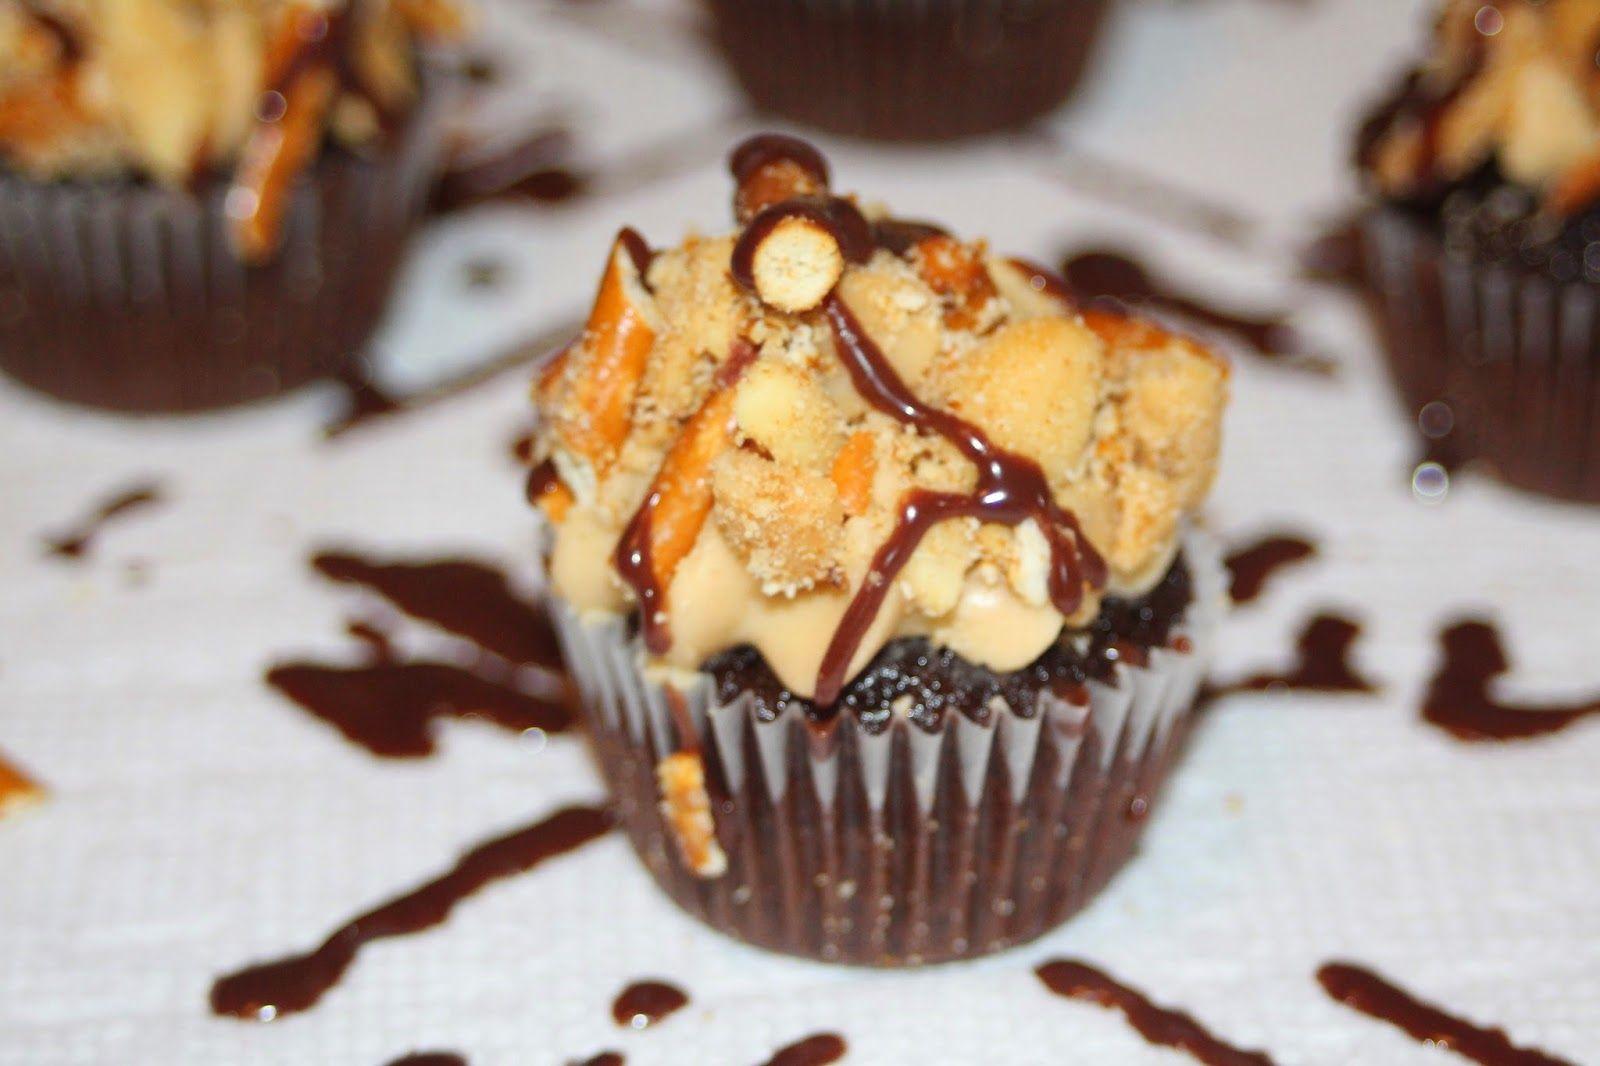 Mini Chocolate Peanut Butter Pretzel Cupcakes